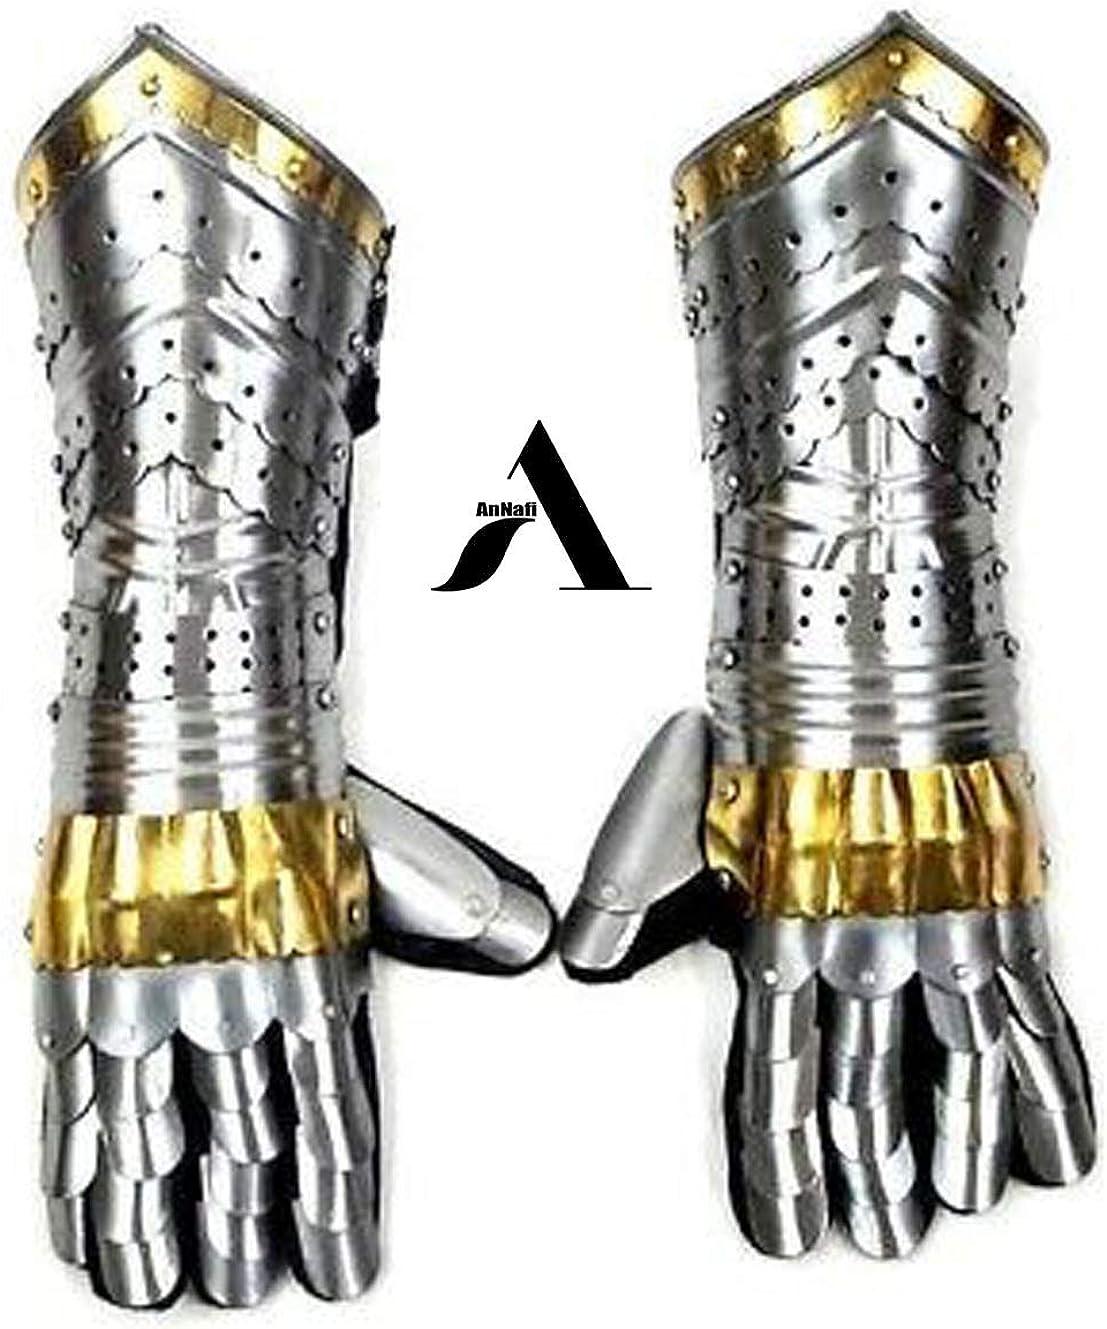 Warrior Metal Gauntlet Medieval Knight Costume AnNafi Armor Gauntlets Steel Gloves Armor Pair